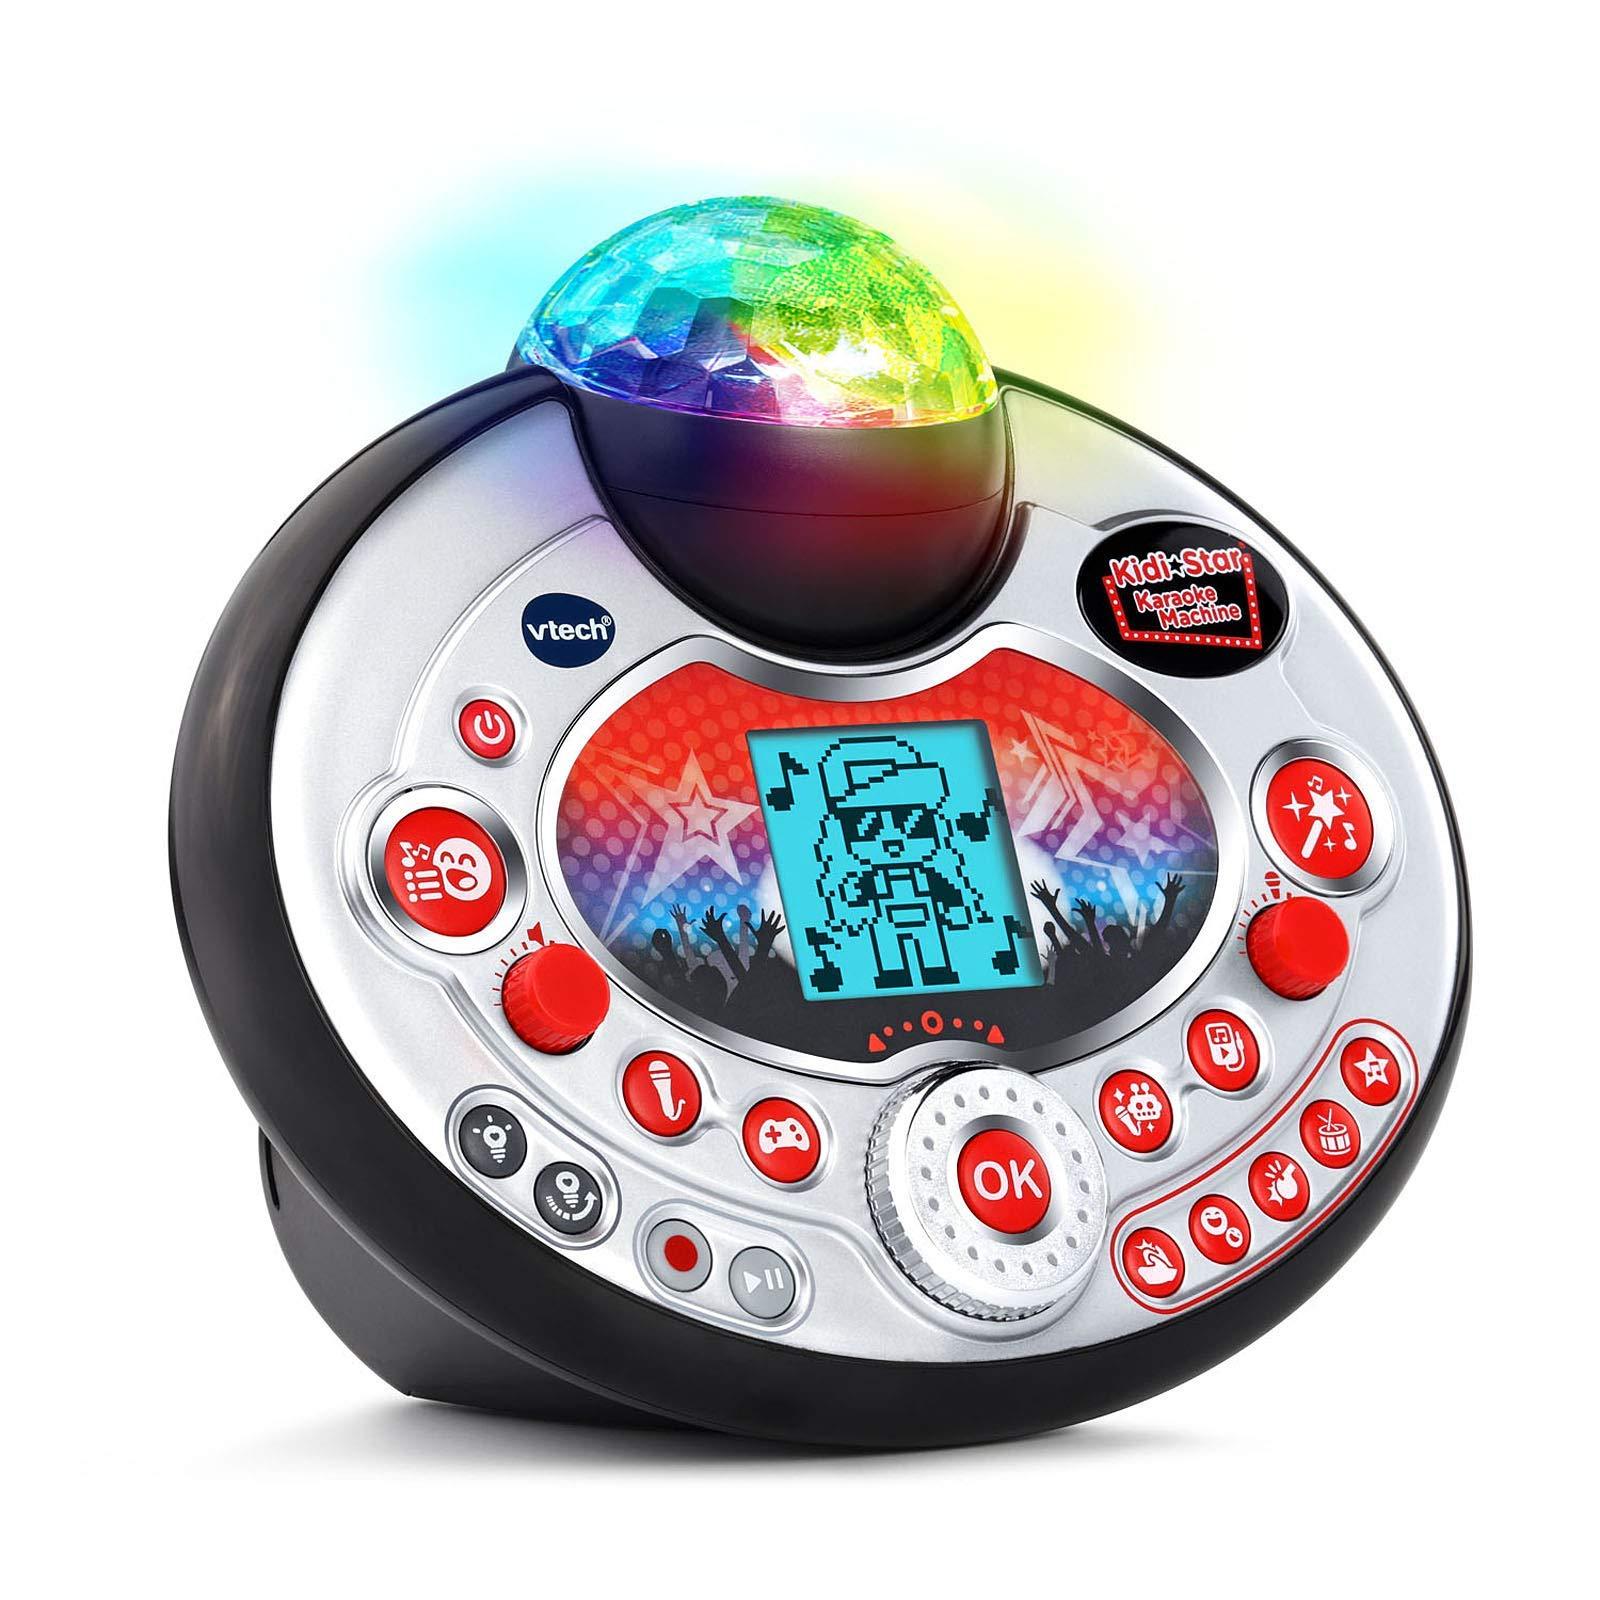 VTech Kidi Star Karaoke Machine (Black) (Renewed) by VTech (Image #2)